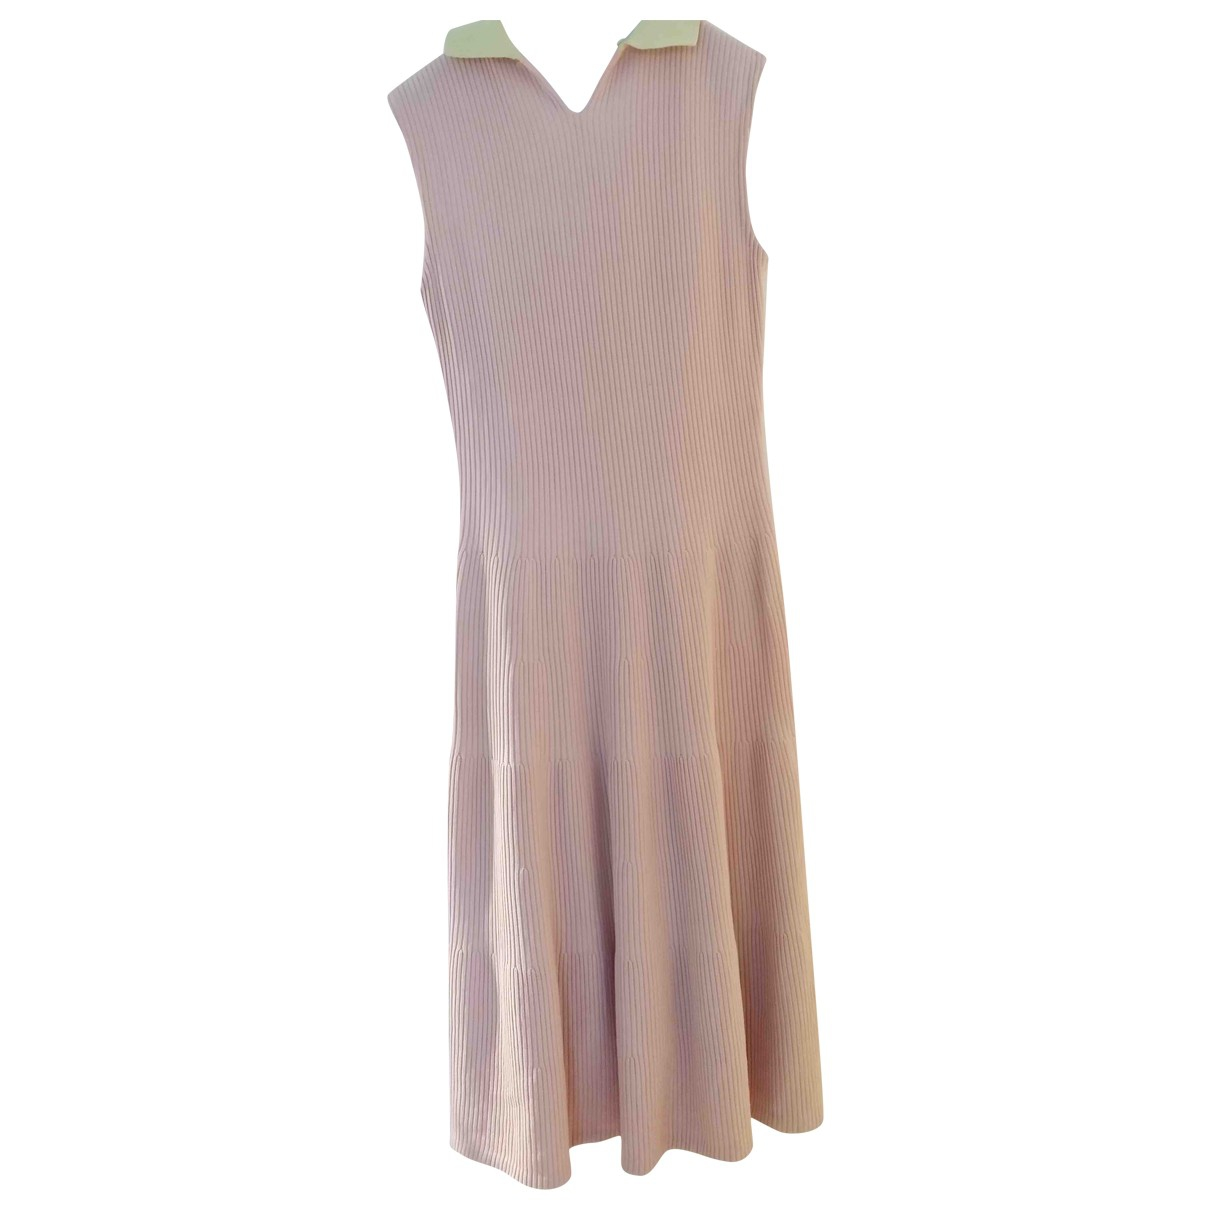 Dior \N Pink Cotton - elasthane dress for Women 34 FR